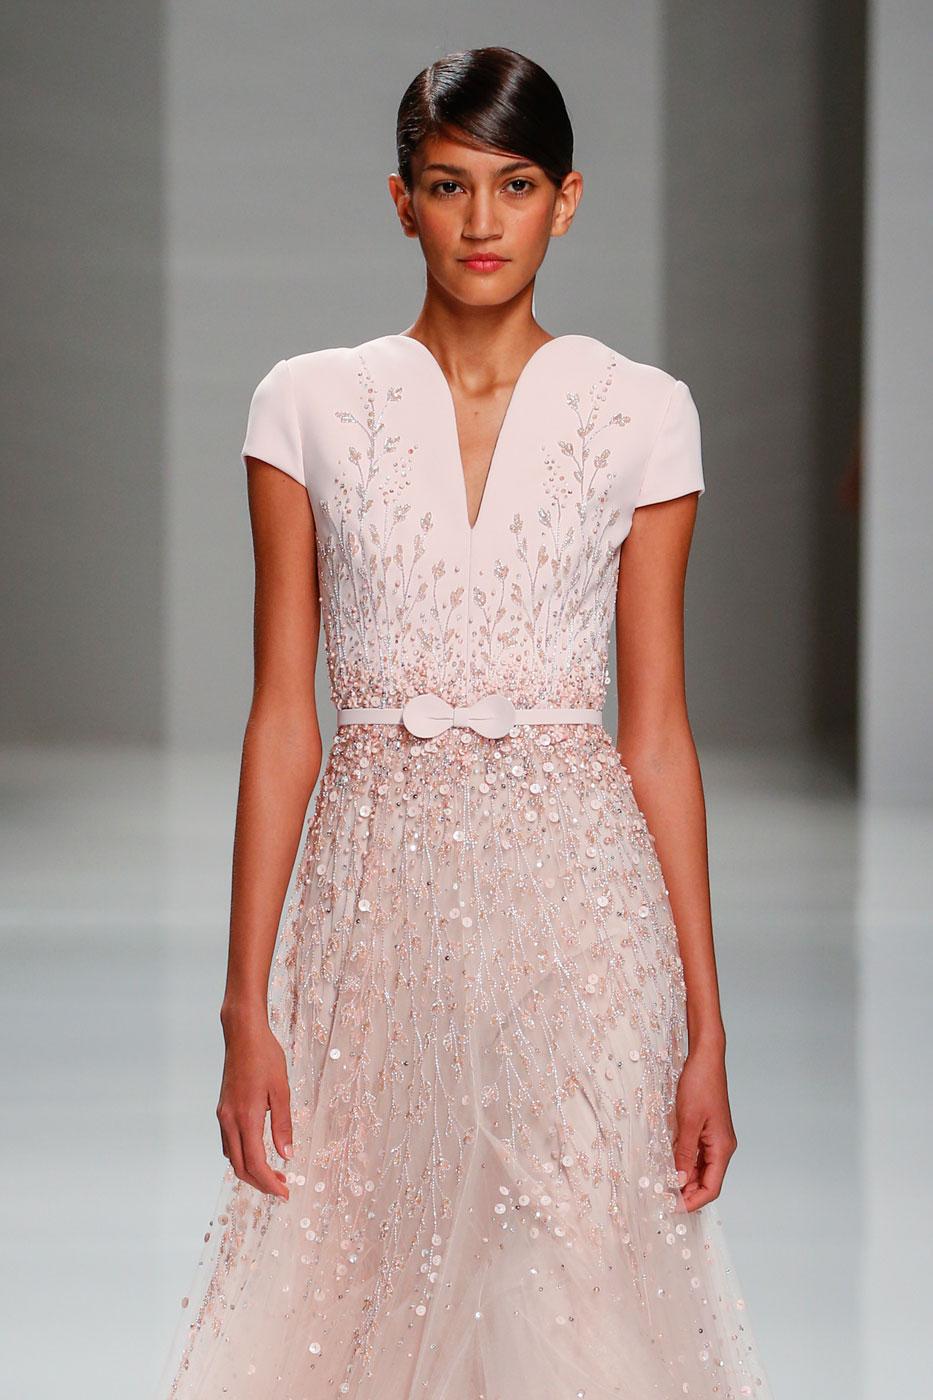 Georges-Hobeika-fashion-runway-show-haute-couture-paris-spring-2015-the-impression-52